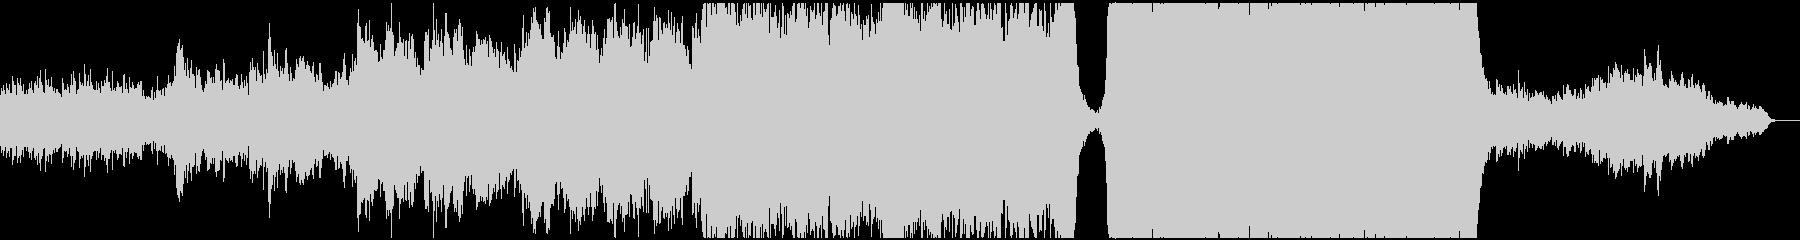 StockMusic35の未再生の波形